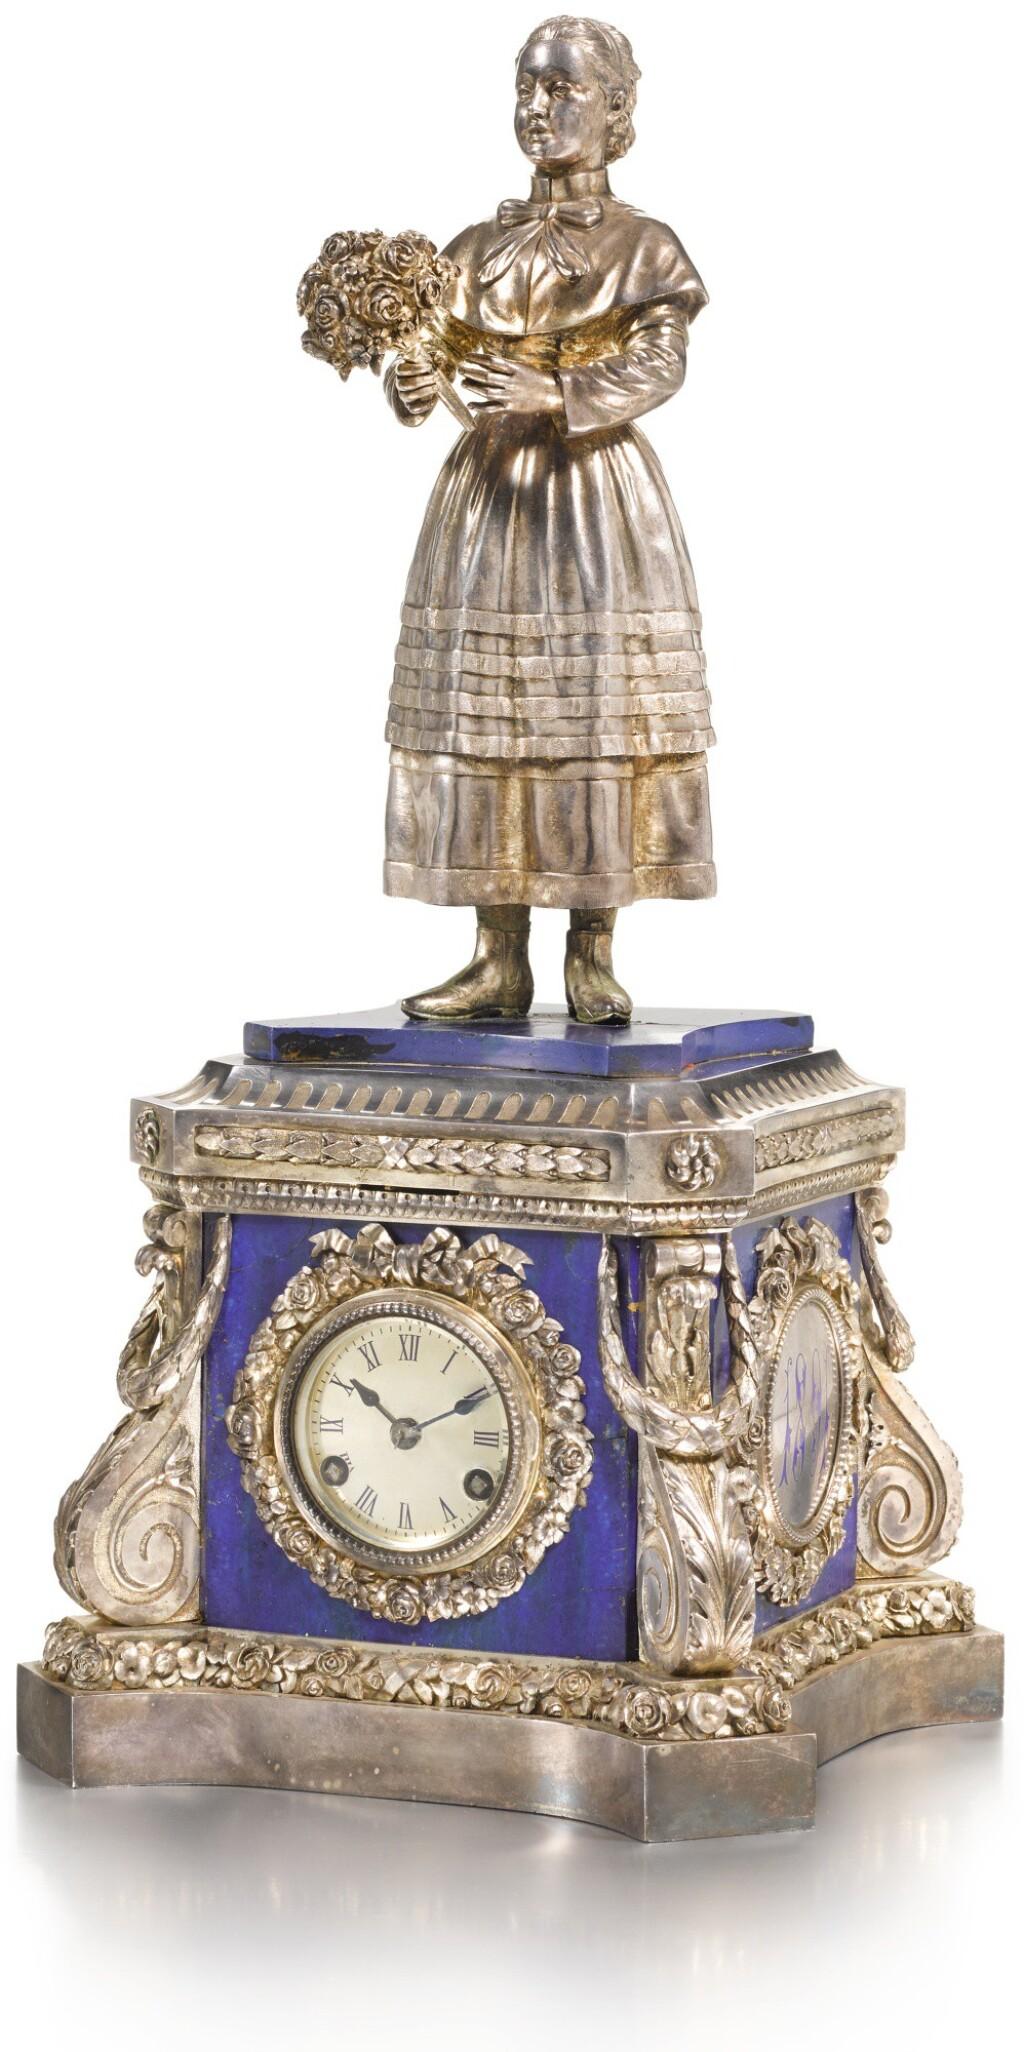 A SILVER, ENAMEL AND LAPIS PRESENTATION CLOCK, KHLEBNIKOV, MOSCOW, 1891